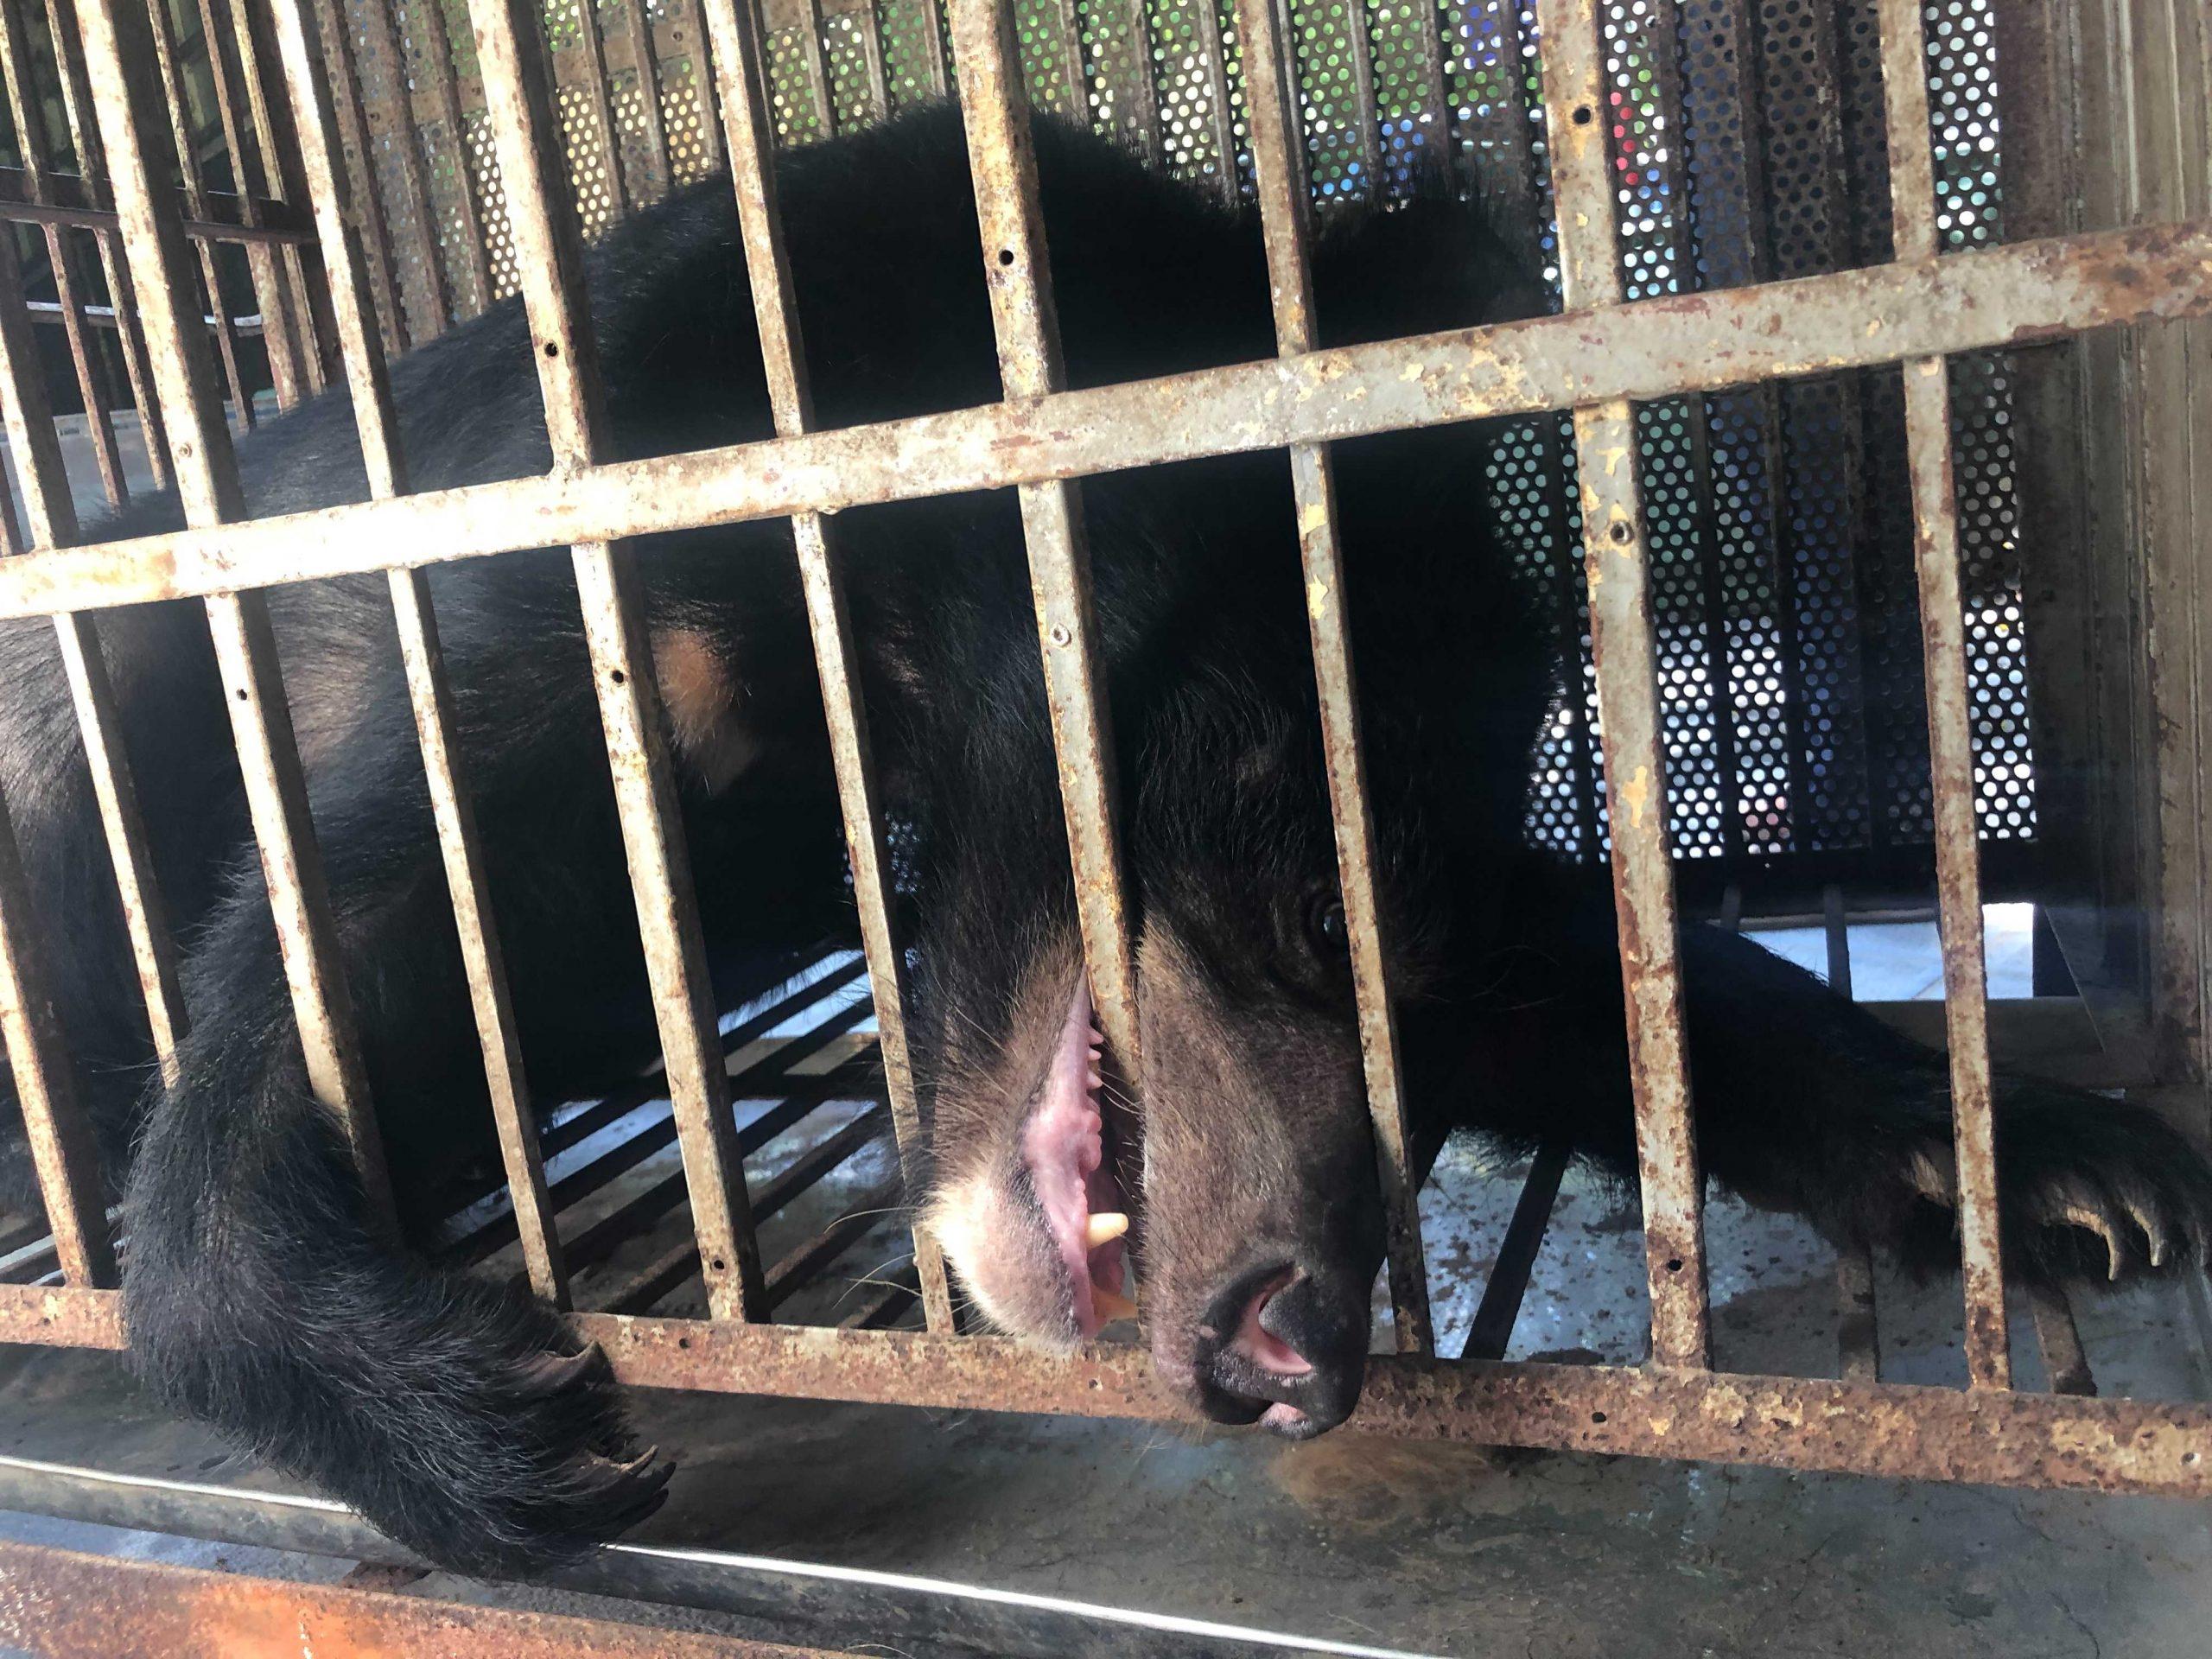 Bear biting bars hanoi circus